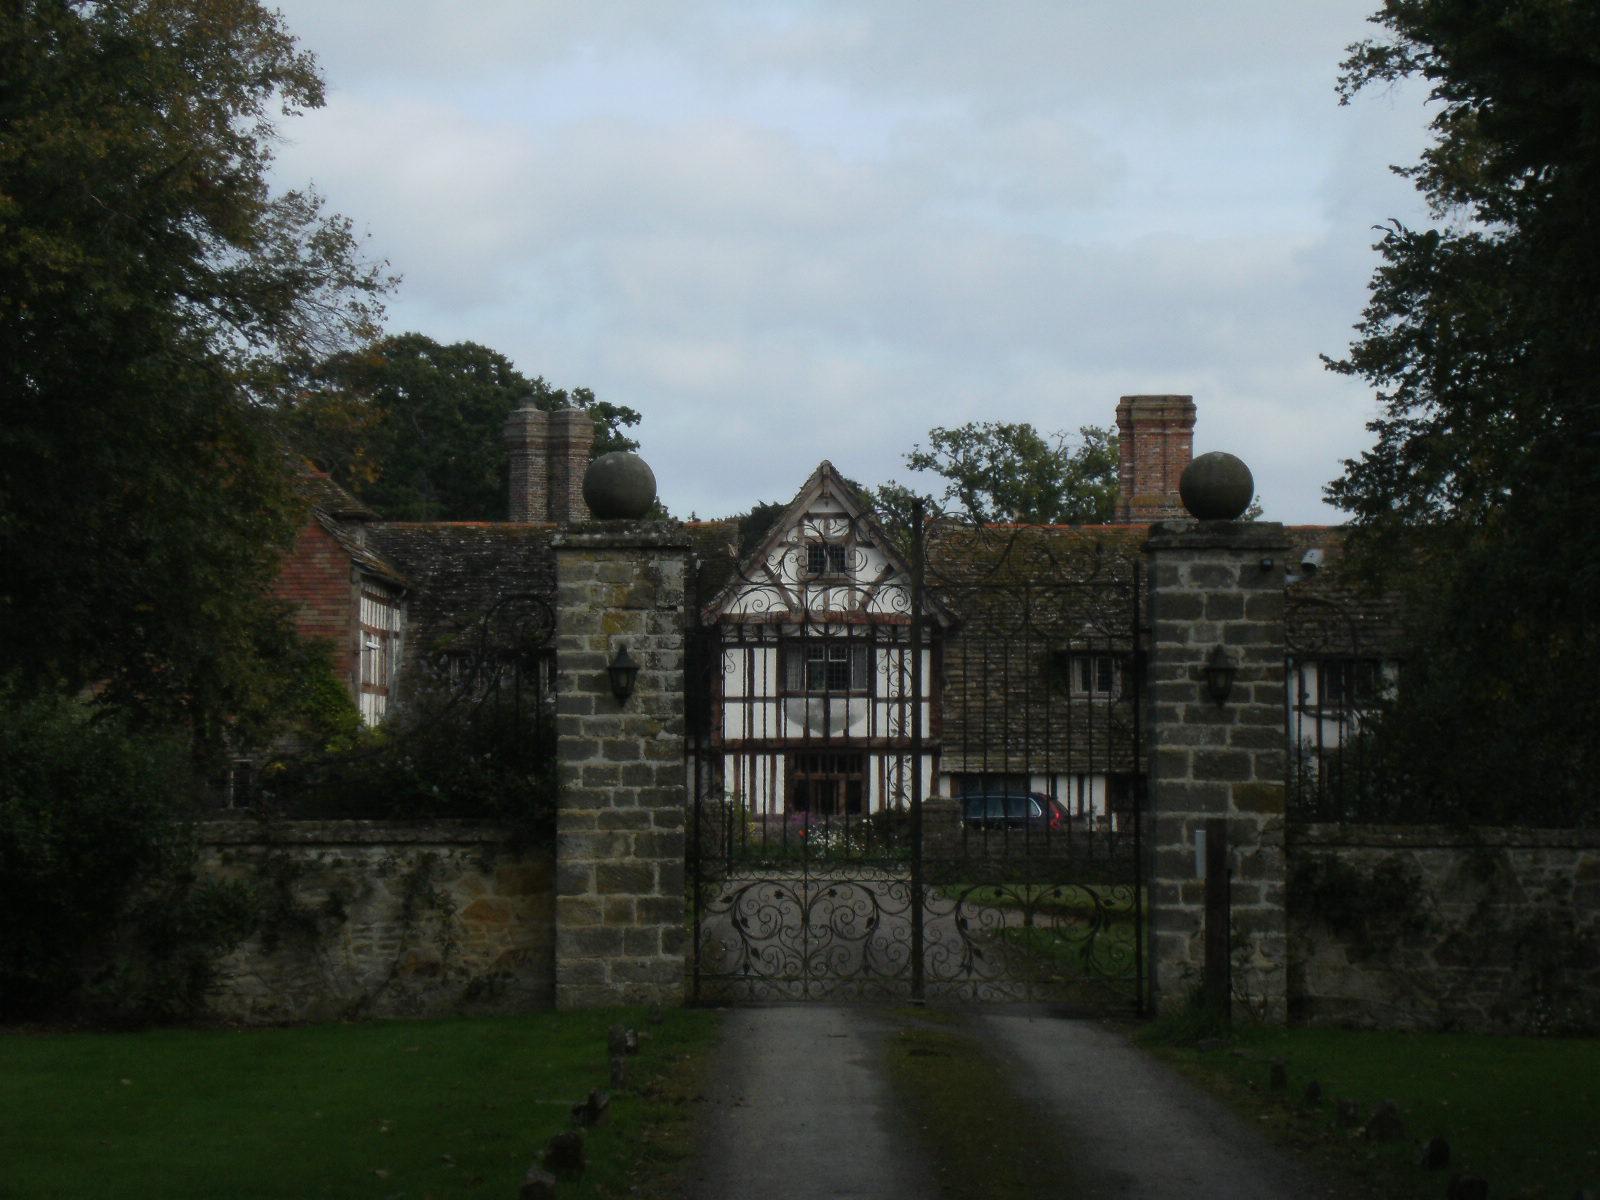 DSCF9668 Broadhurst Manor